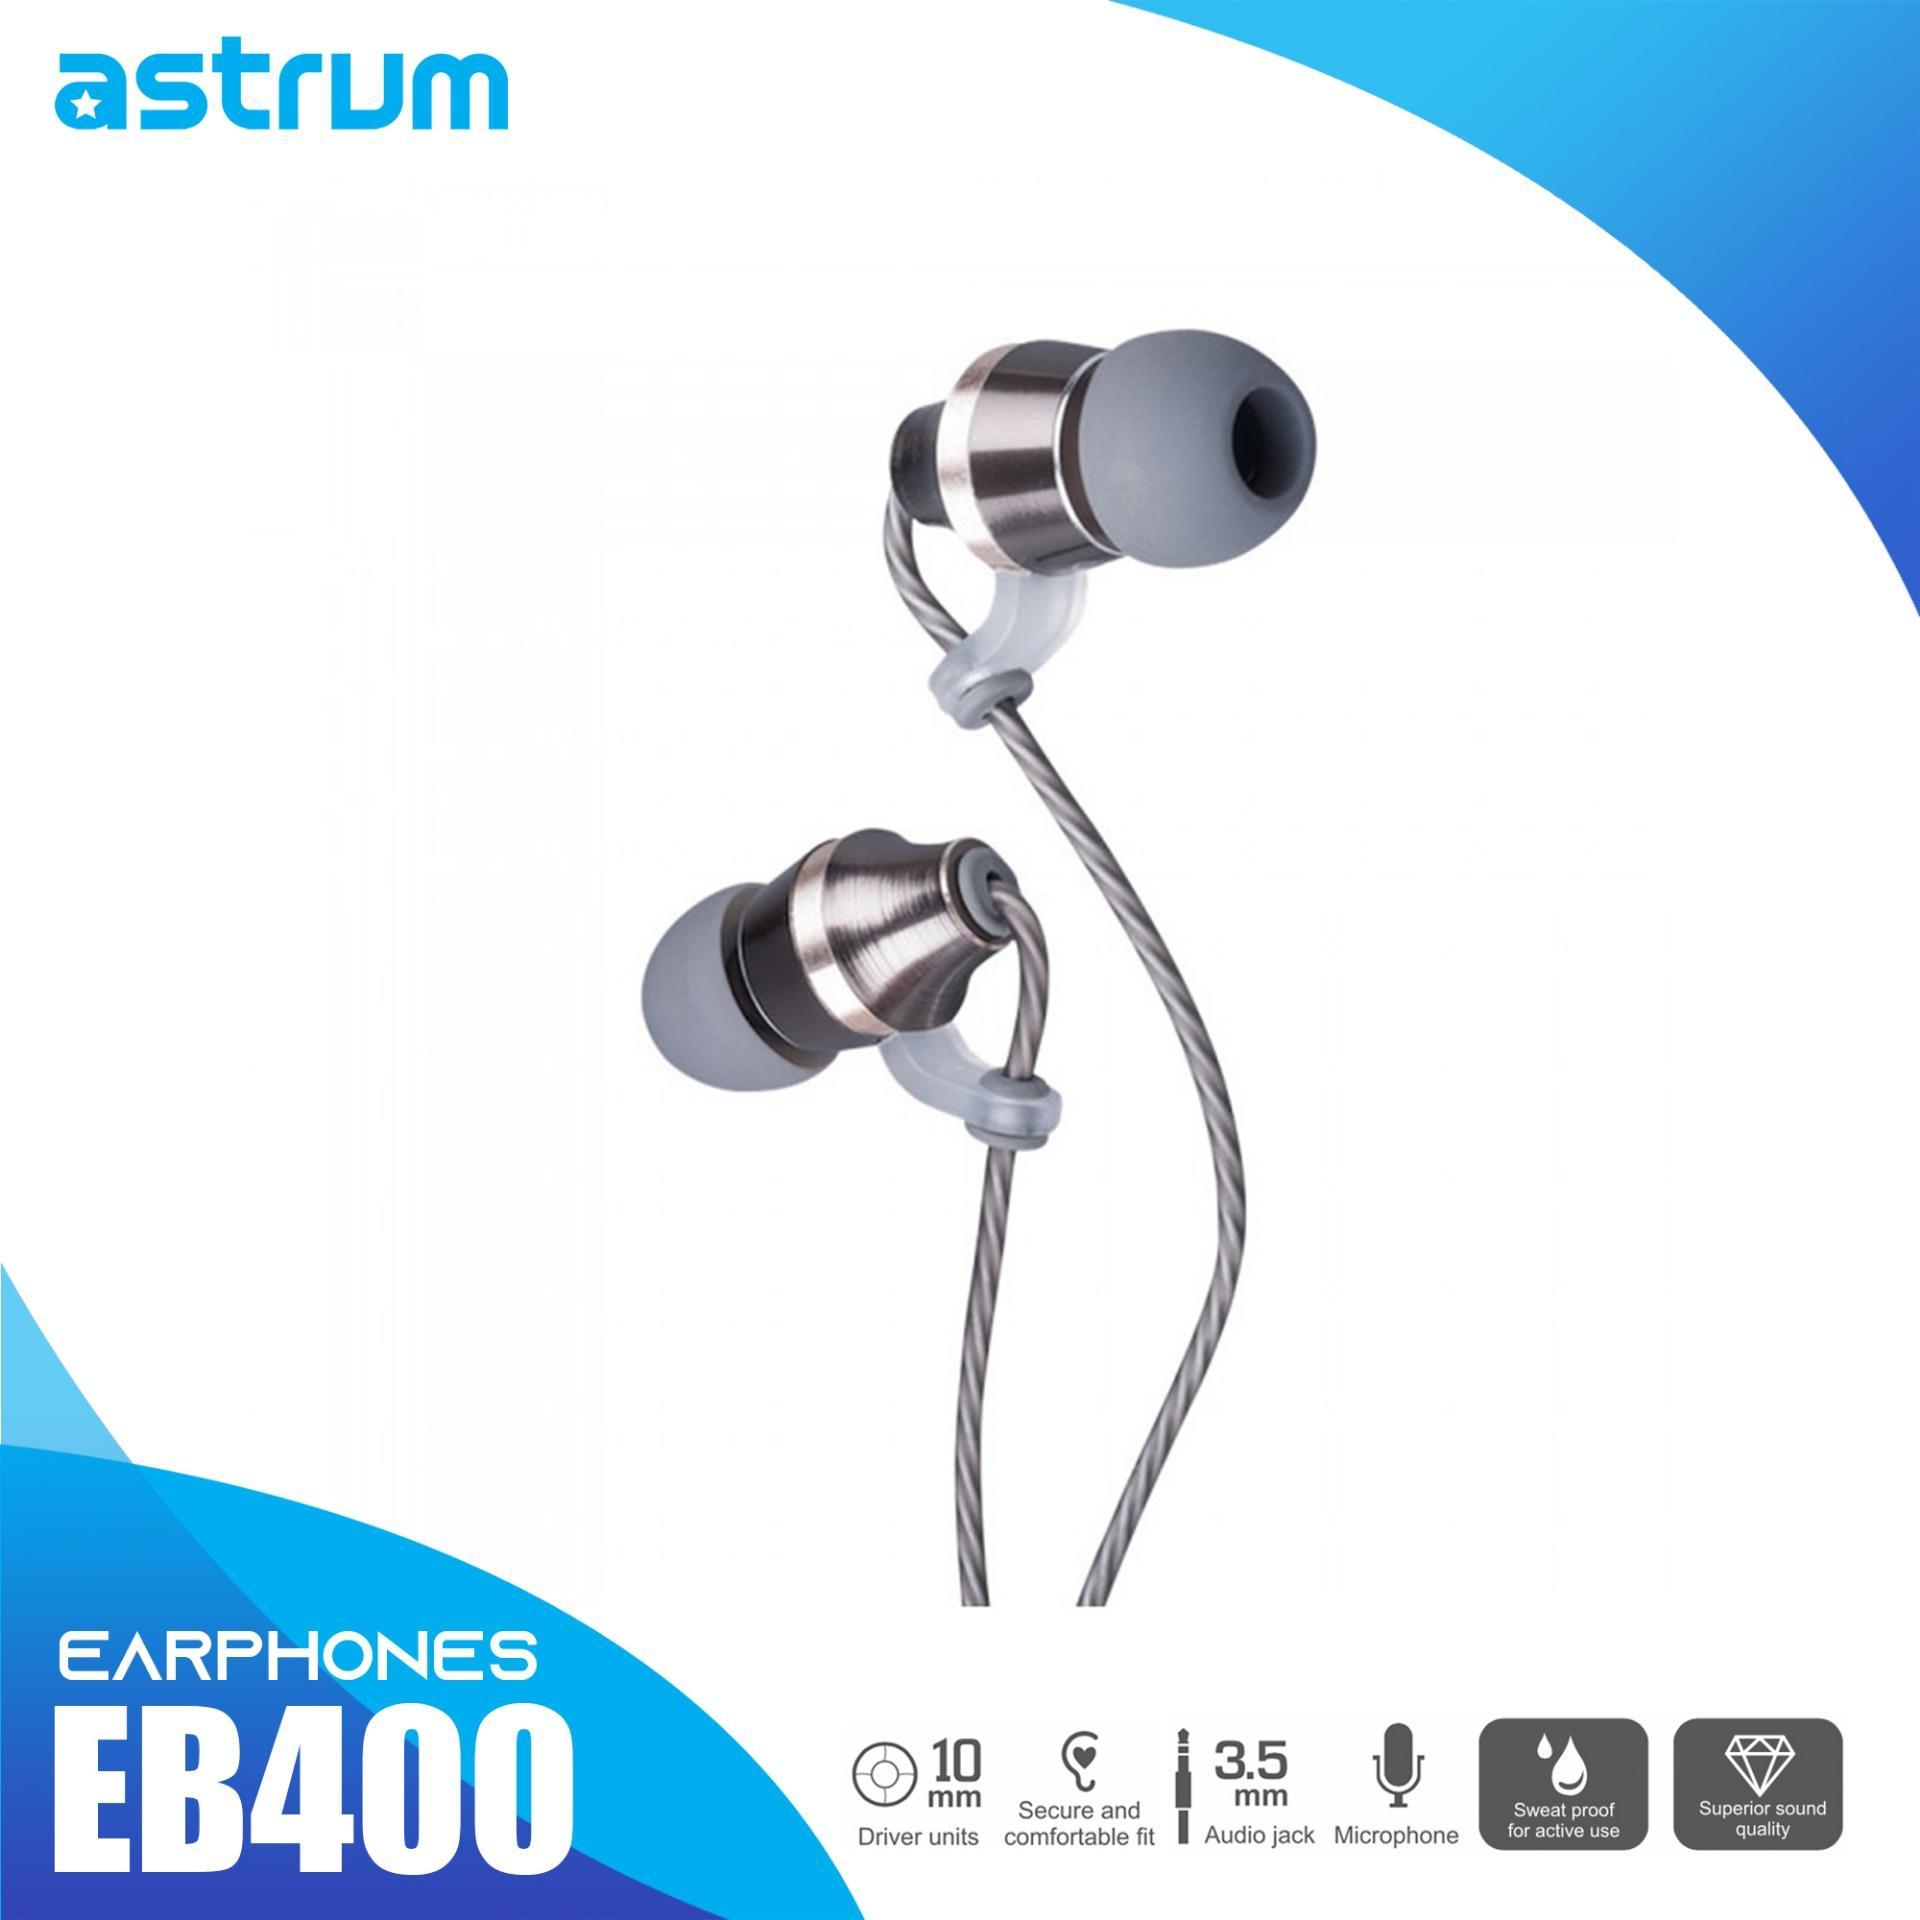 In-ear Headphone for sale - In-ear Headphones prices, brands & specs